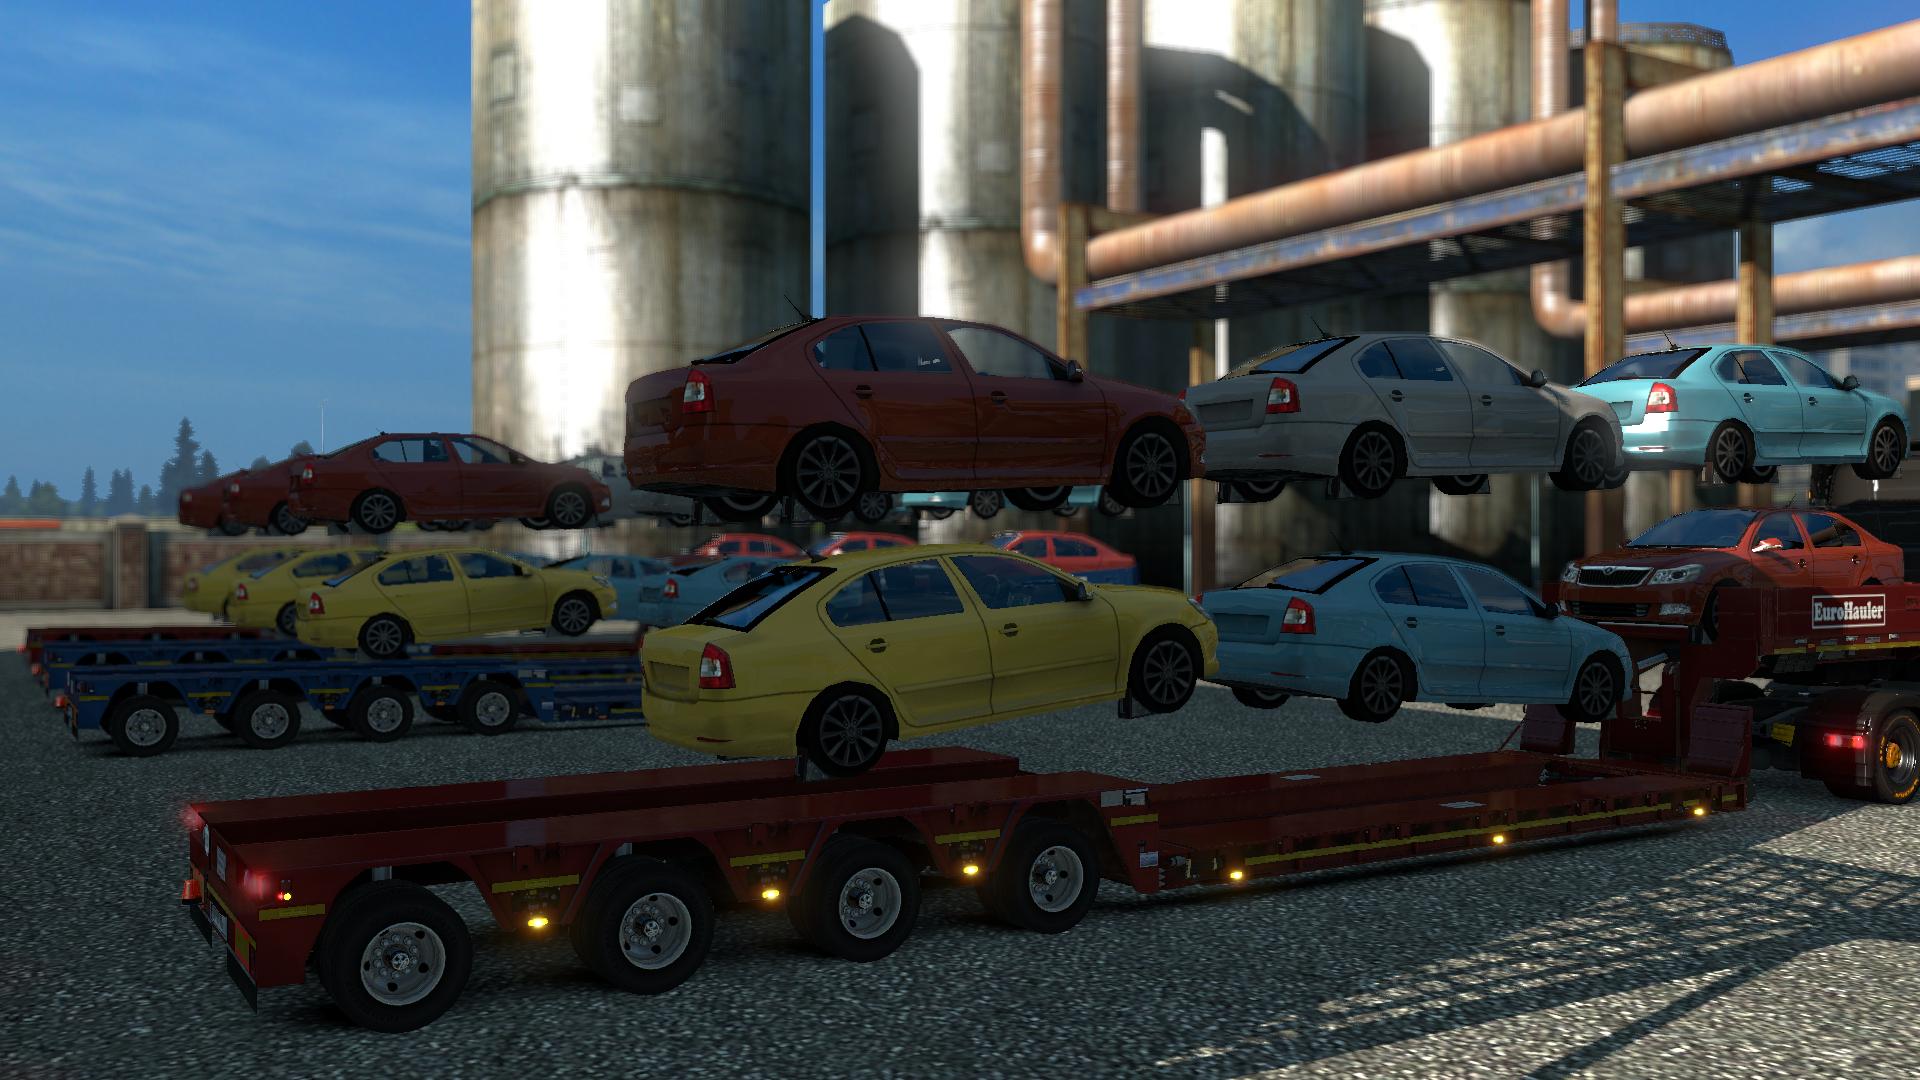 Goldhofer Cars File Euro Truck Simulator 2 Multiplayer Mod For